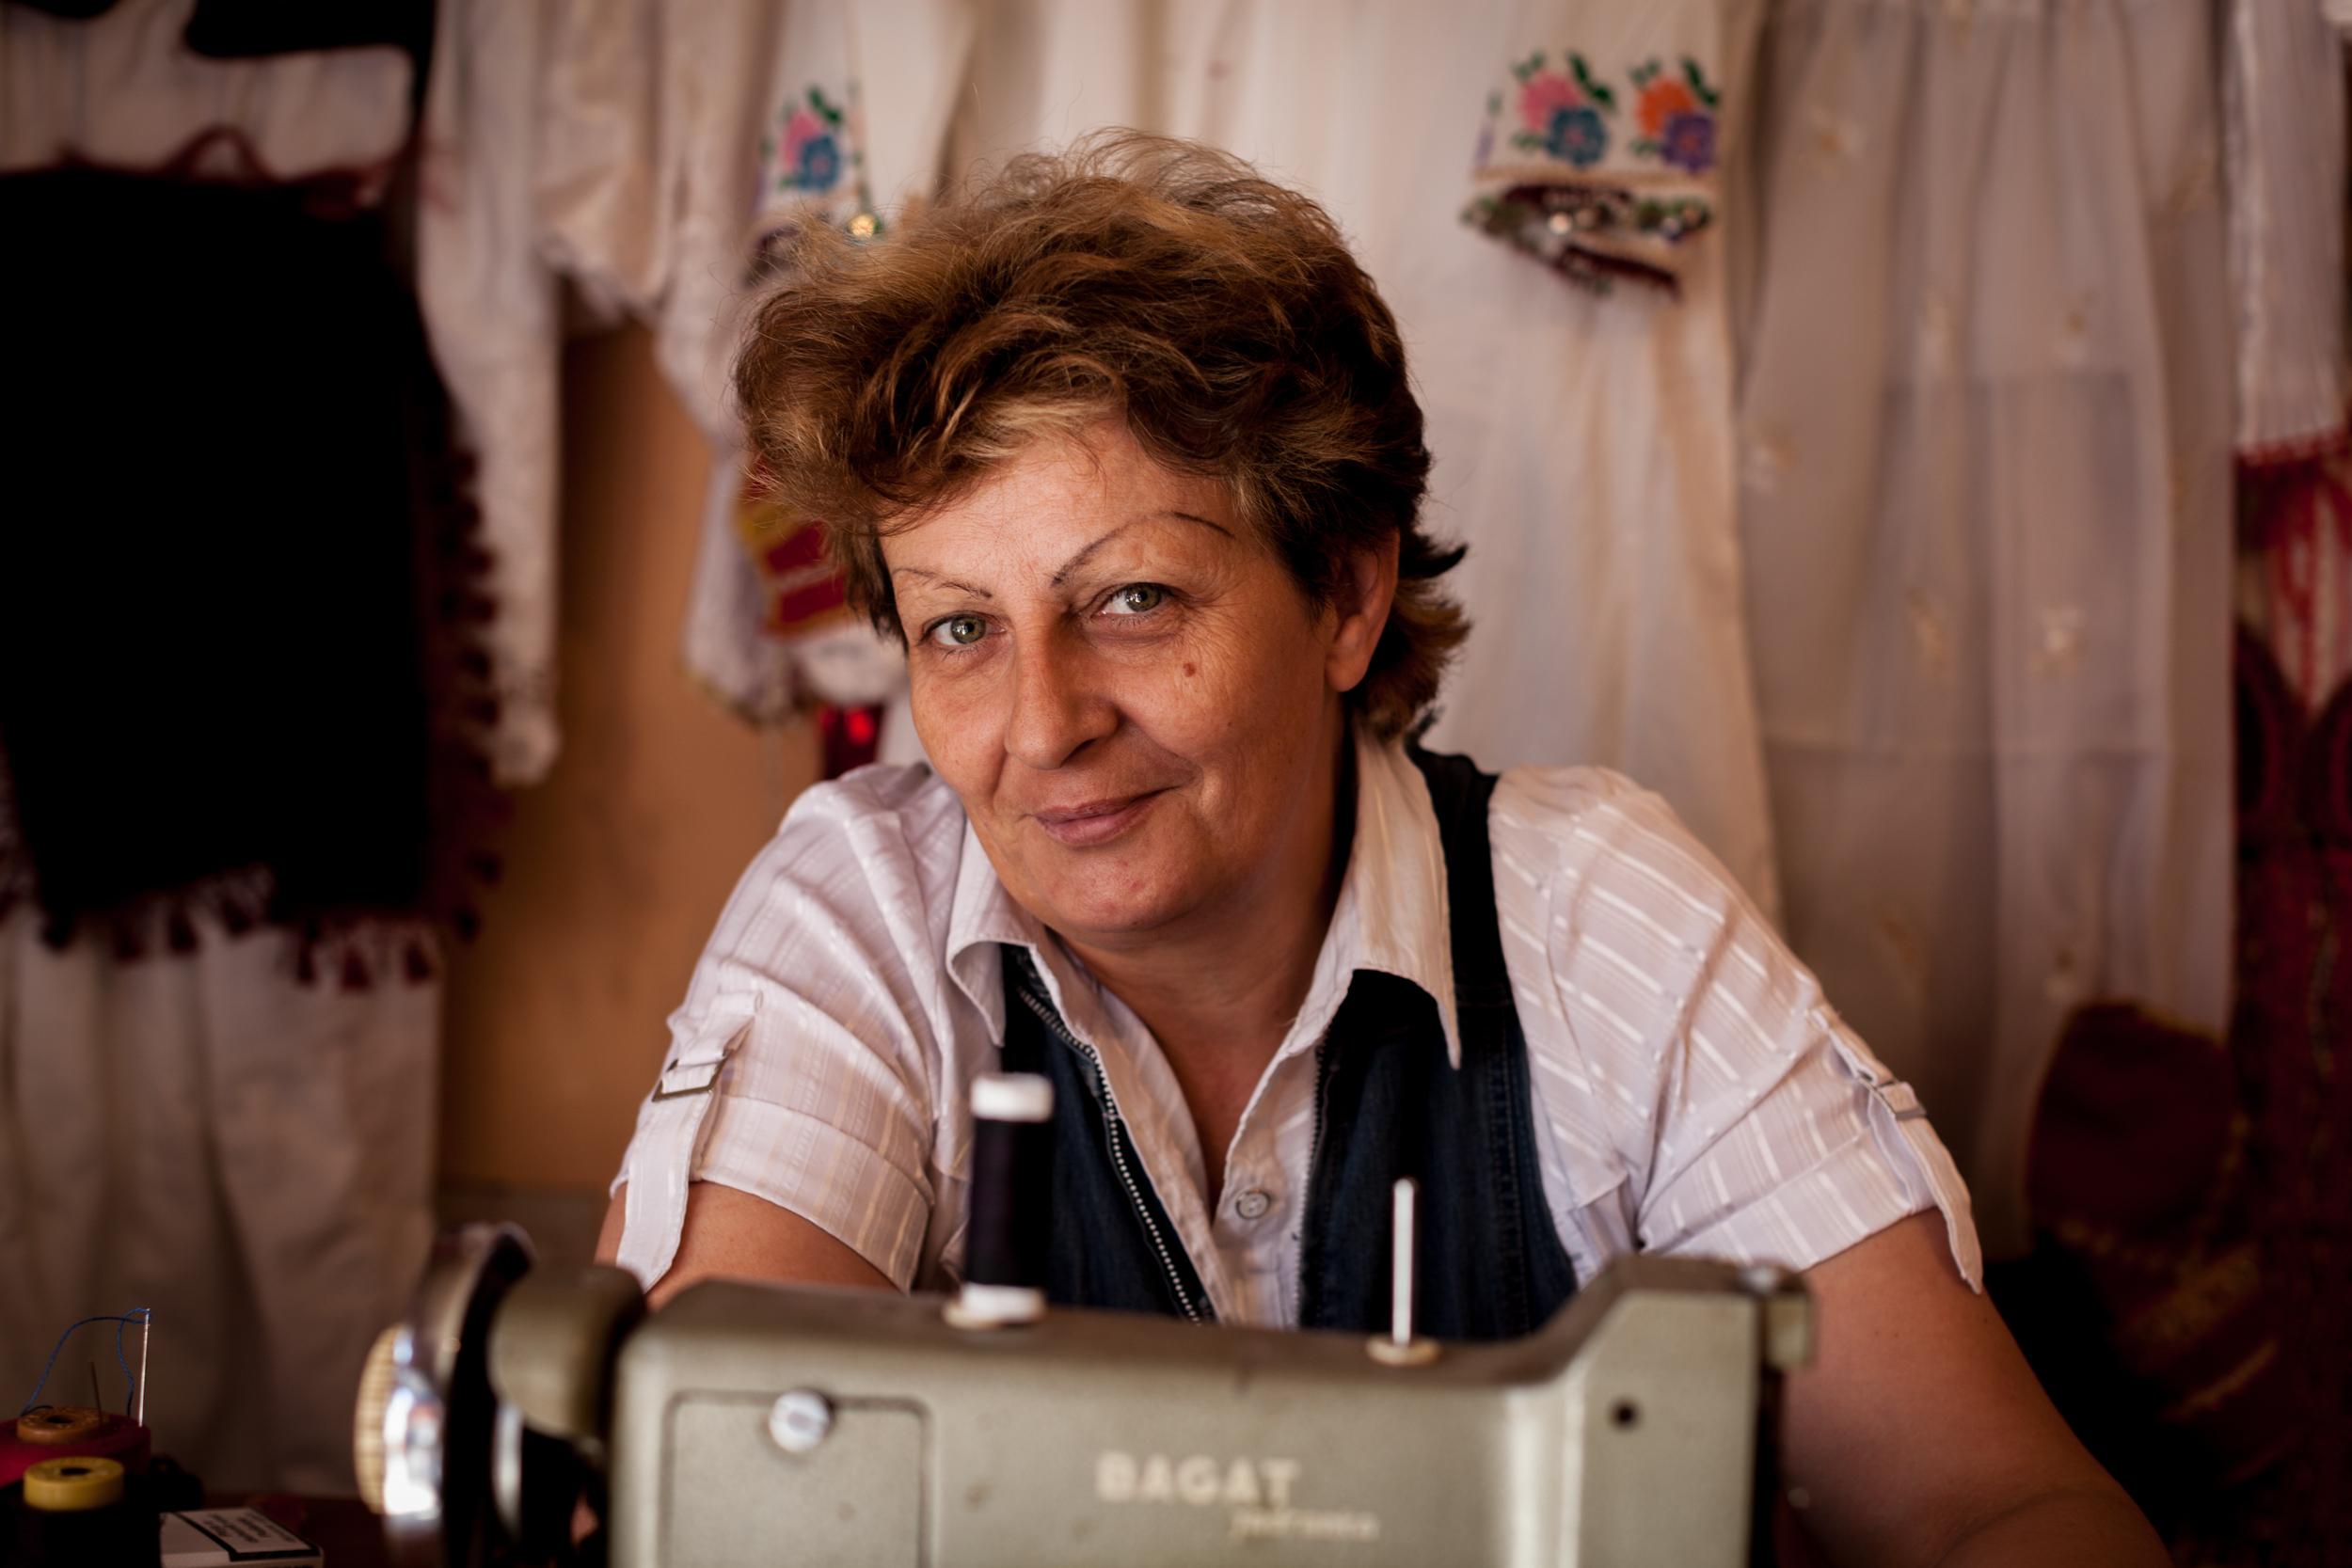 Albanian traditional clothing maker | Prizren, Kosovo